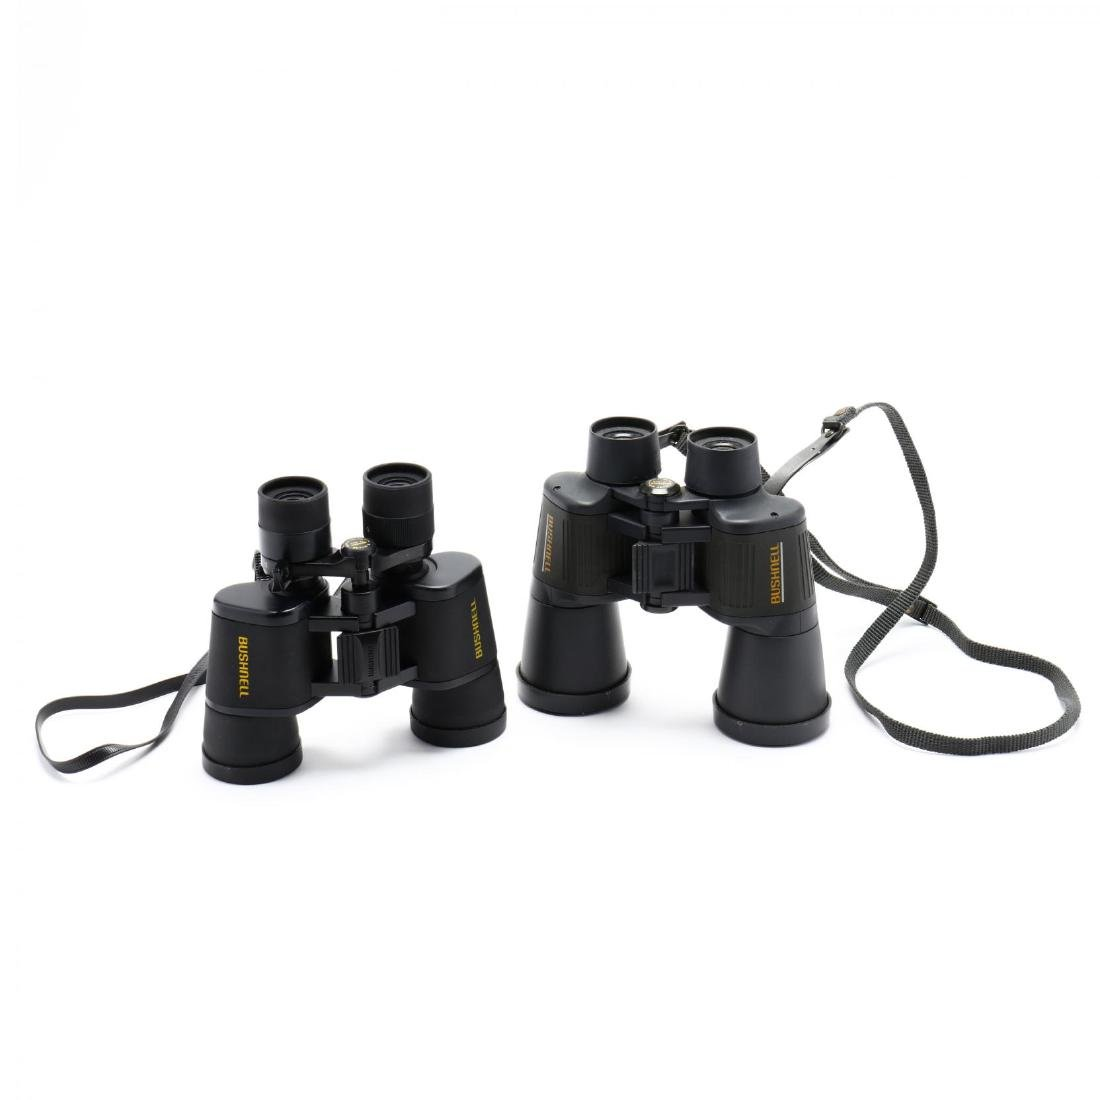 Two Pairs of Bushnell Binoculars - 3